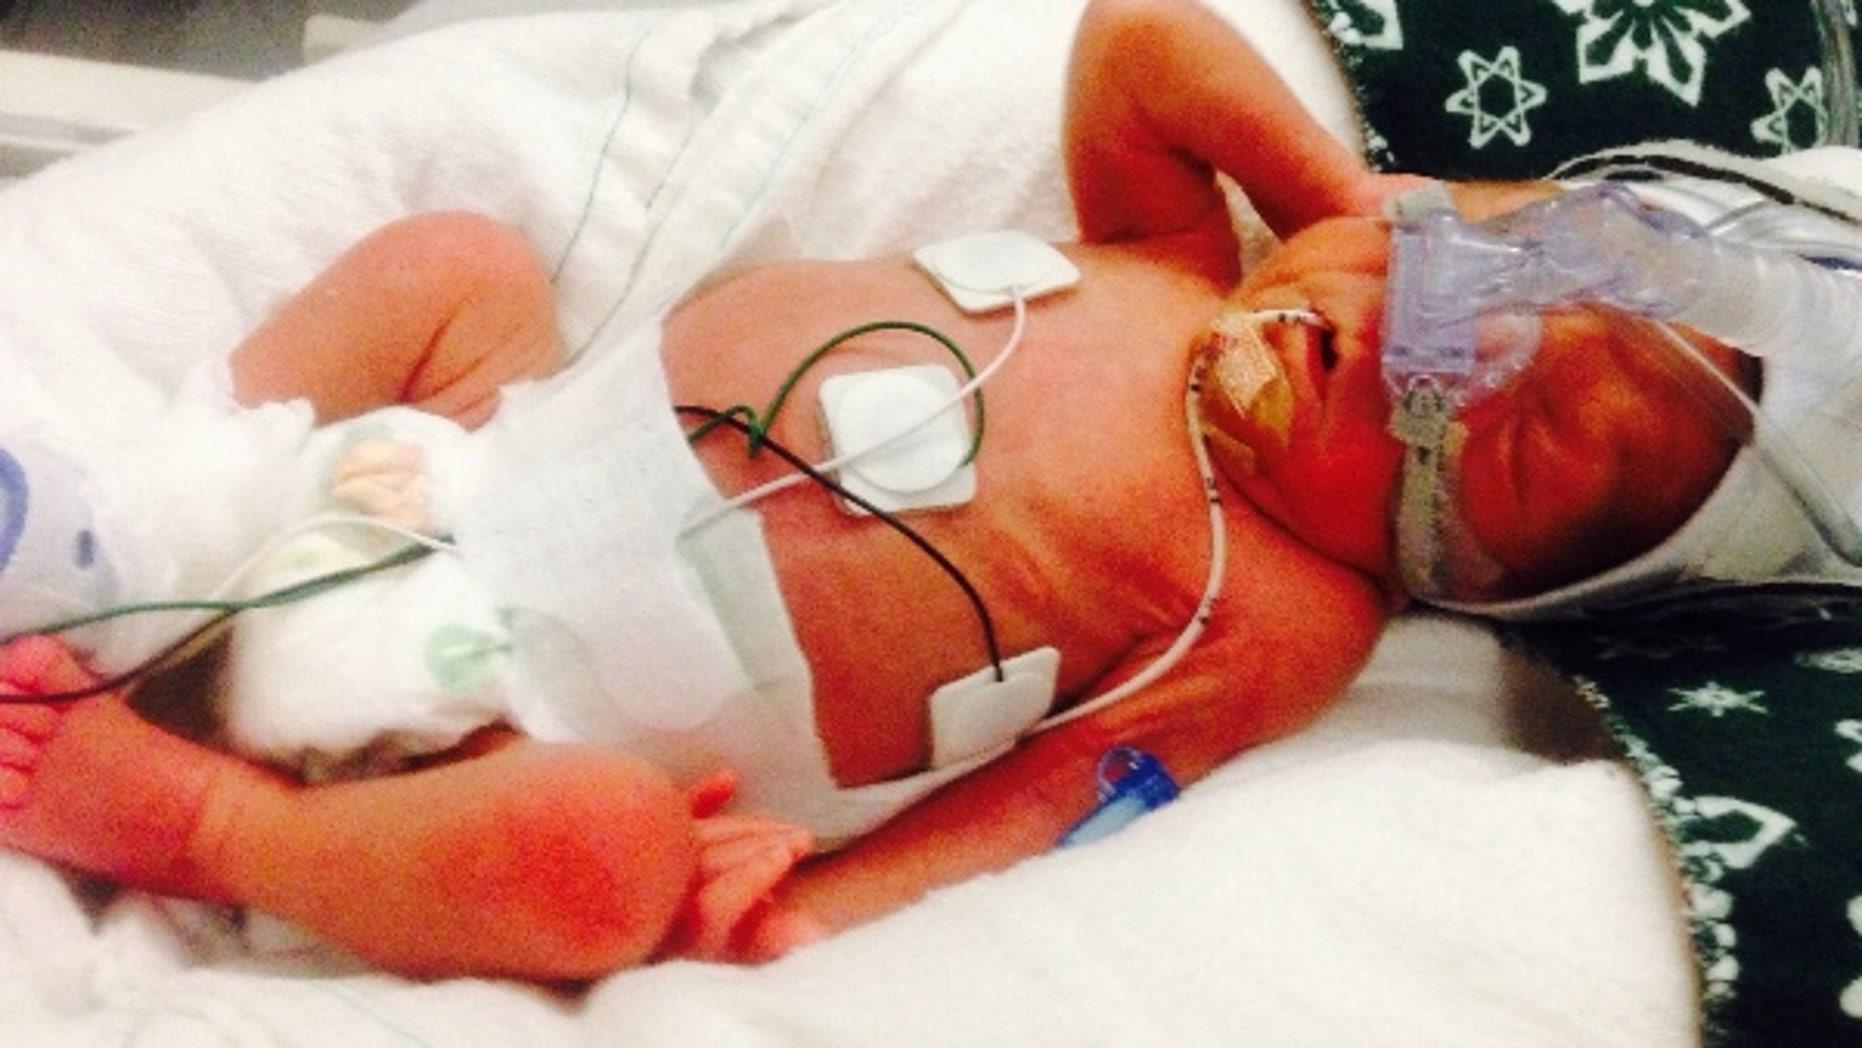 Baby Salvatore, 1 week old.